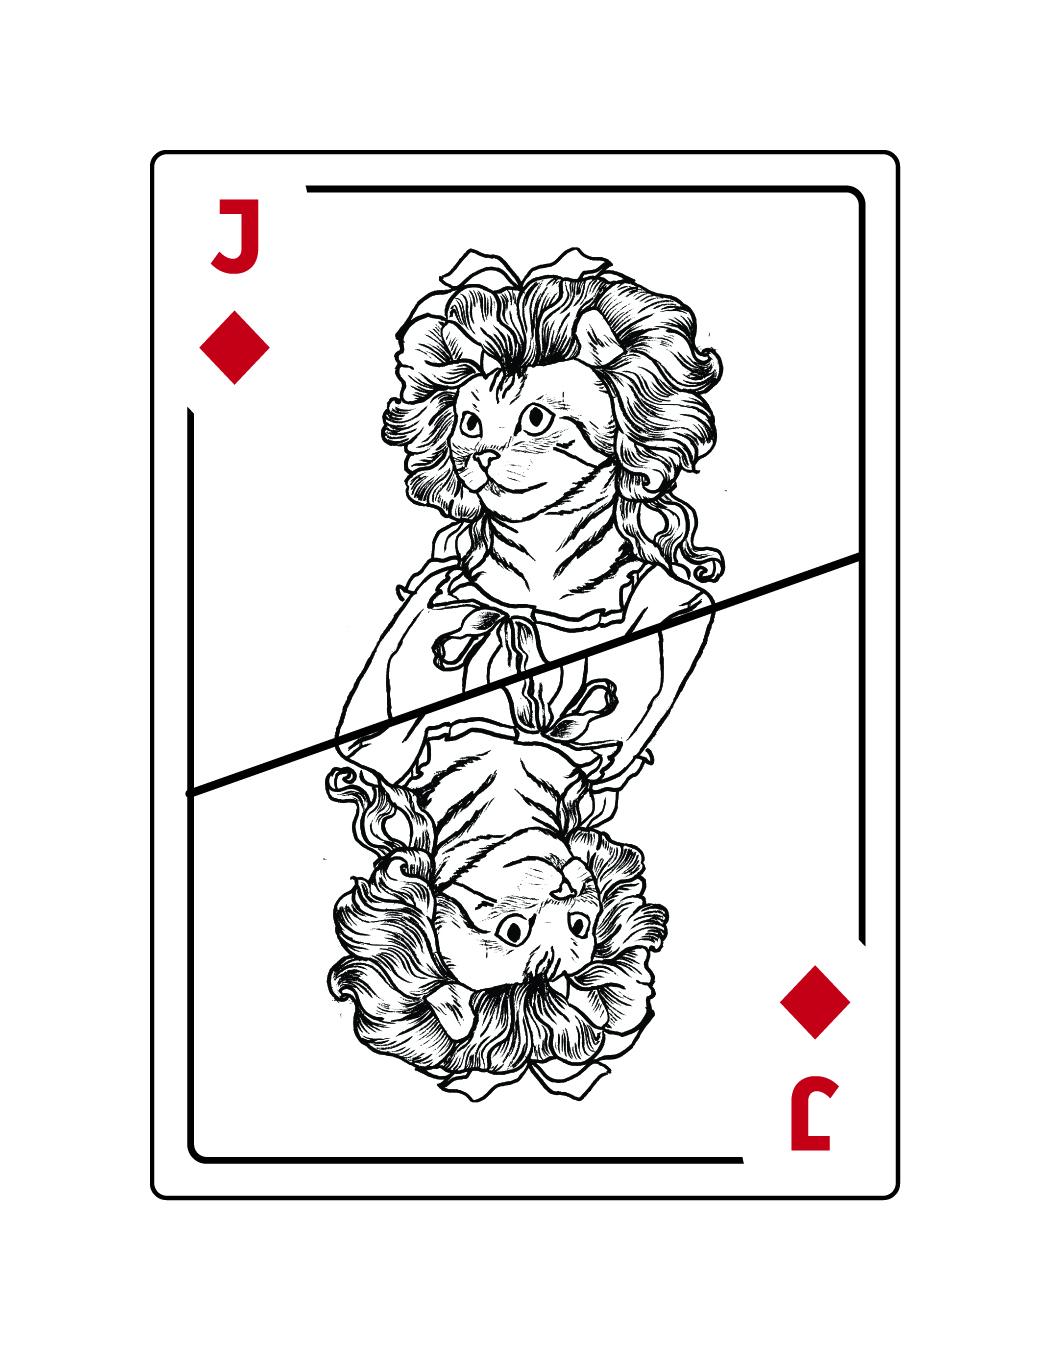 card_draft_1-17.jpg